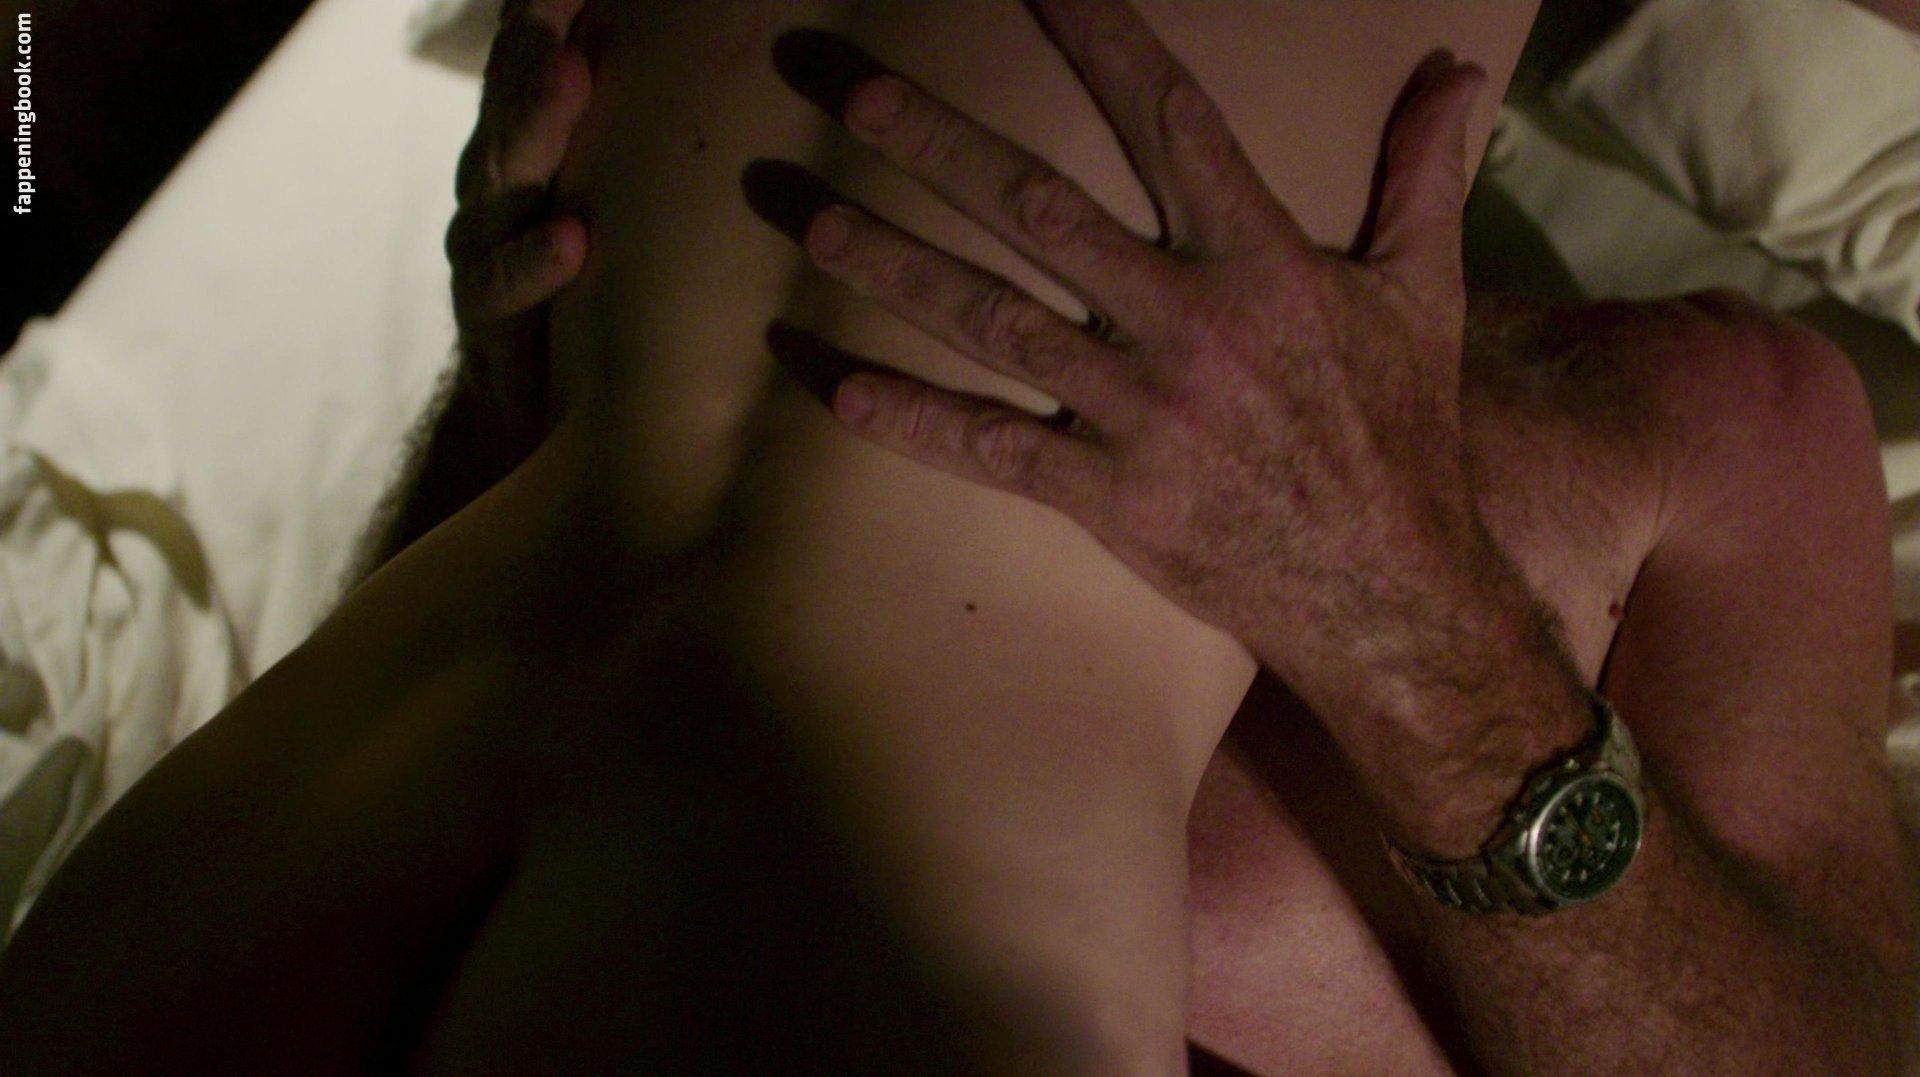 Katee sackhoff nude pic